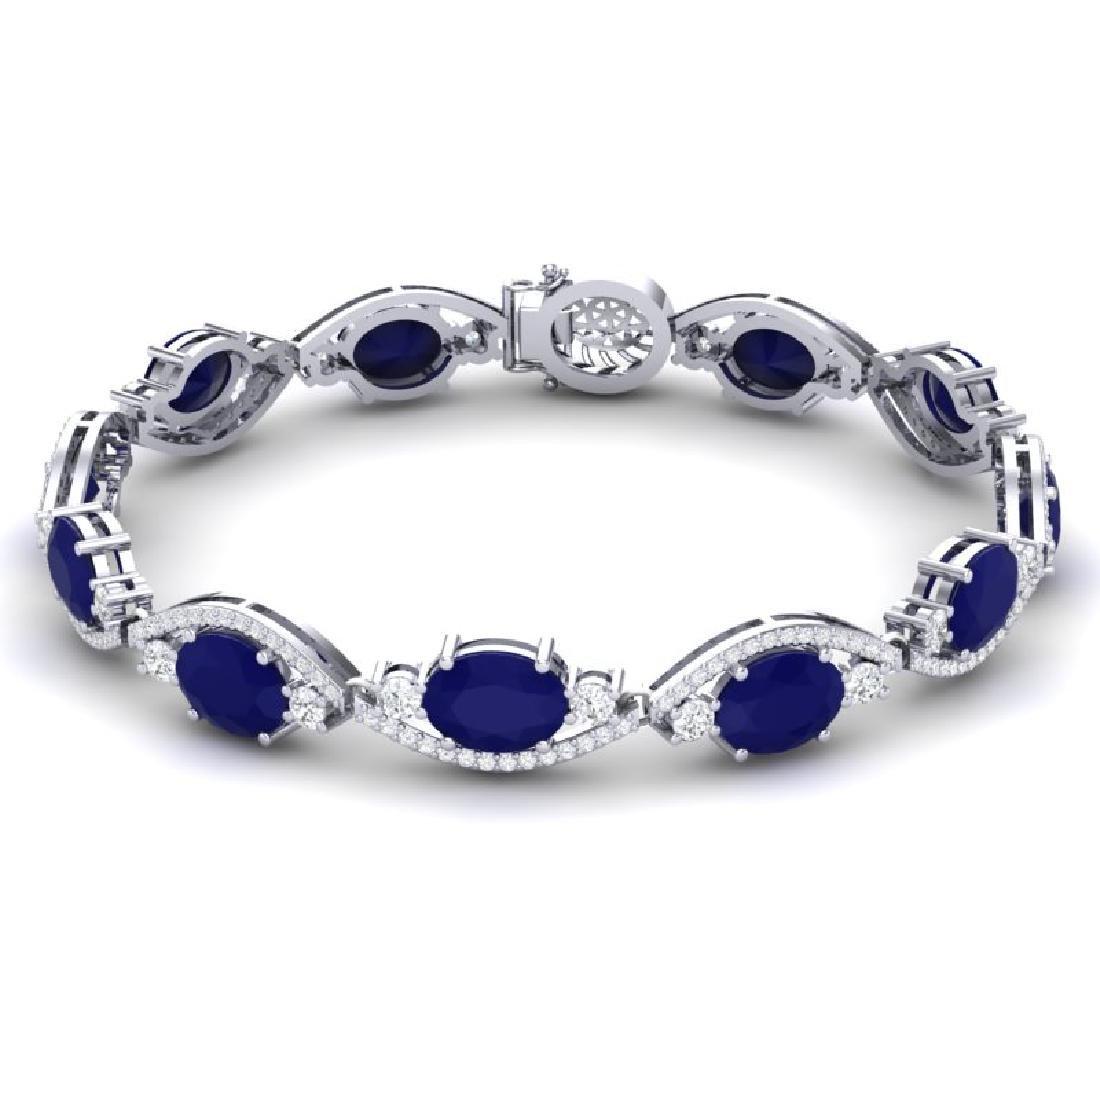 22.15 CTW Royalty Sapphire & VS Diamond Bracelet 18K - 3